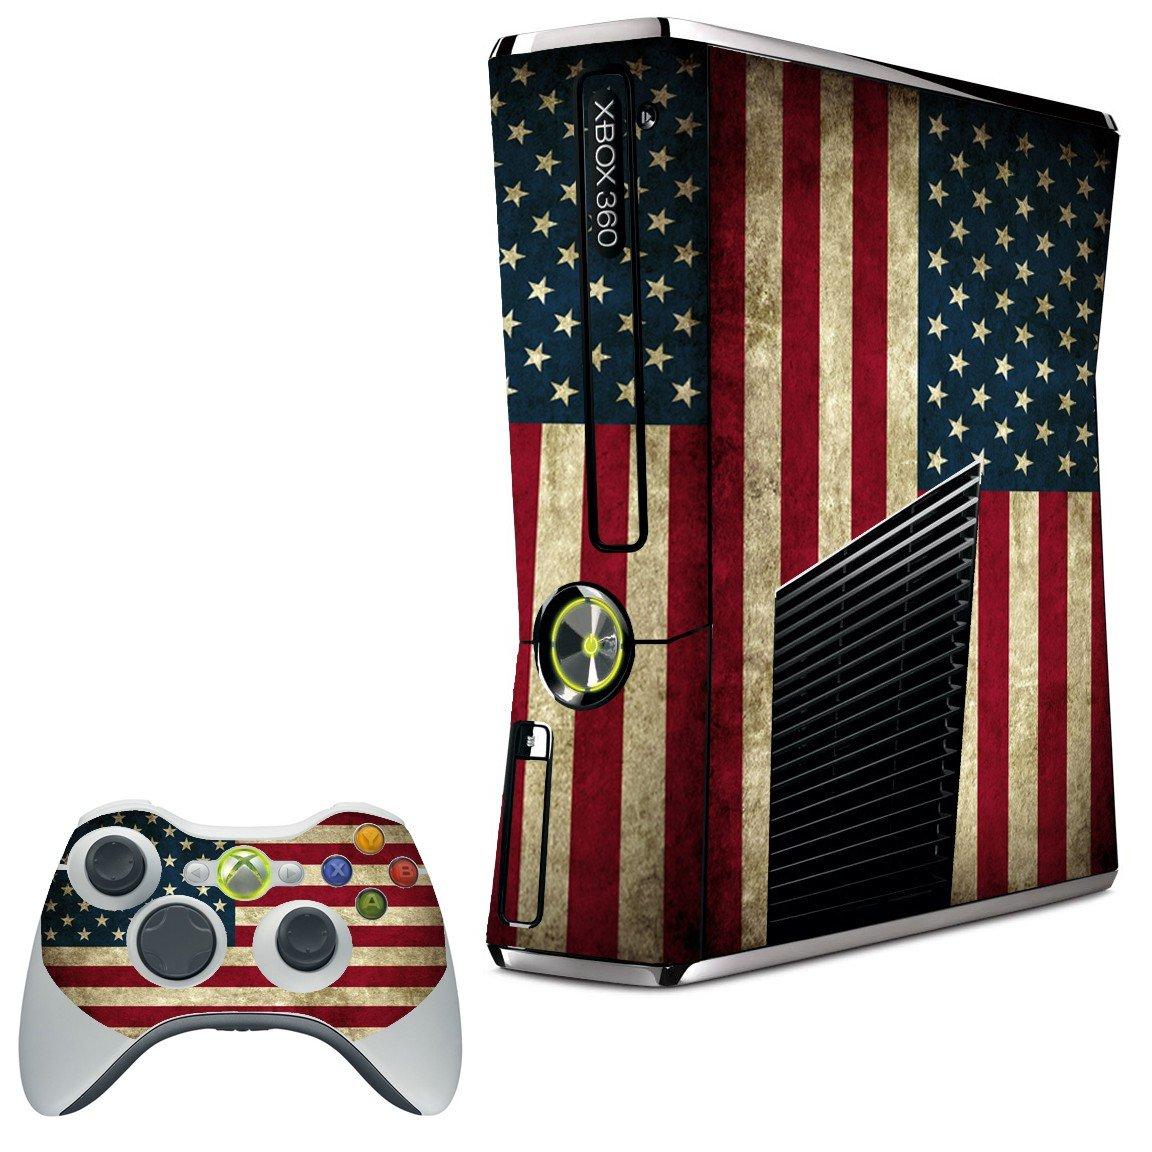 AMERICAN FLAG XBOX 360 SLIM GAME CONSOLE SKIN